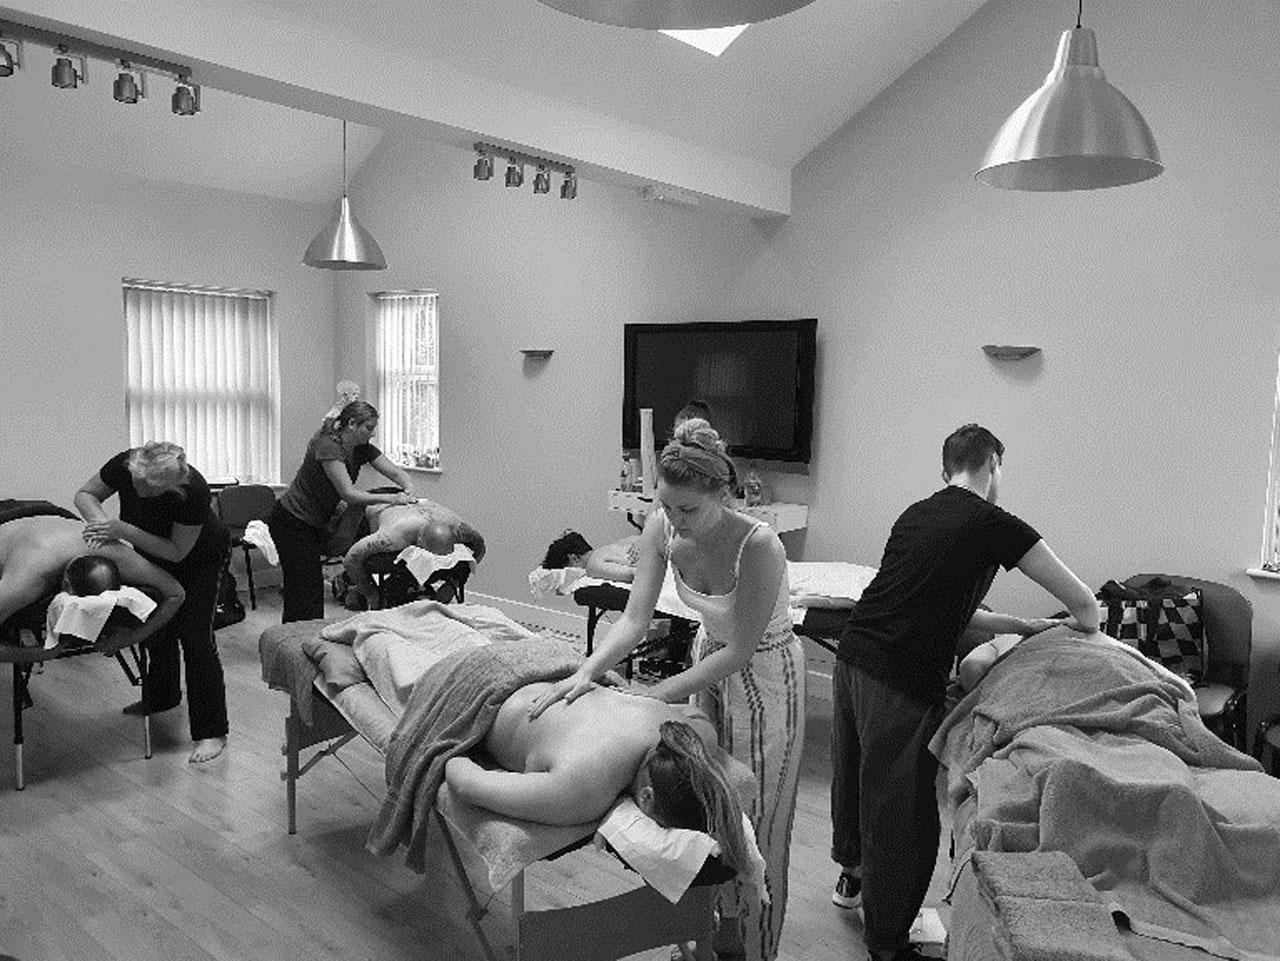 image-79-school-group-massaging_large